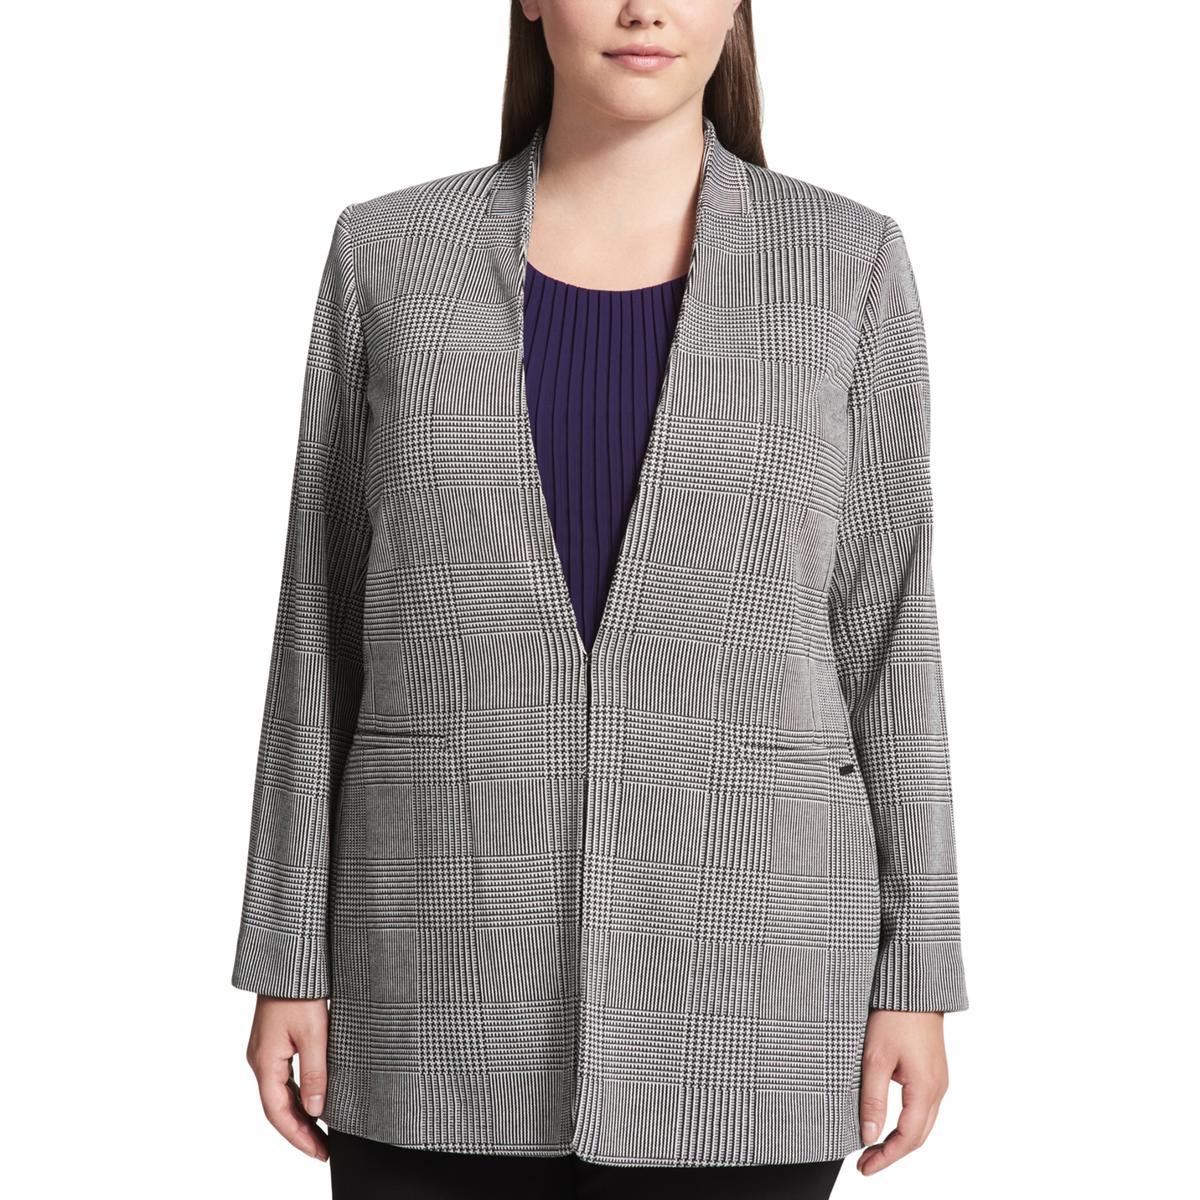 44f6a7685d5 Details about Calvin Klein Womens Glen Plaid Business One-Button Blazer  Jacket Plus BHFO 3657